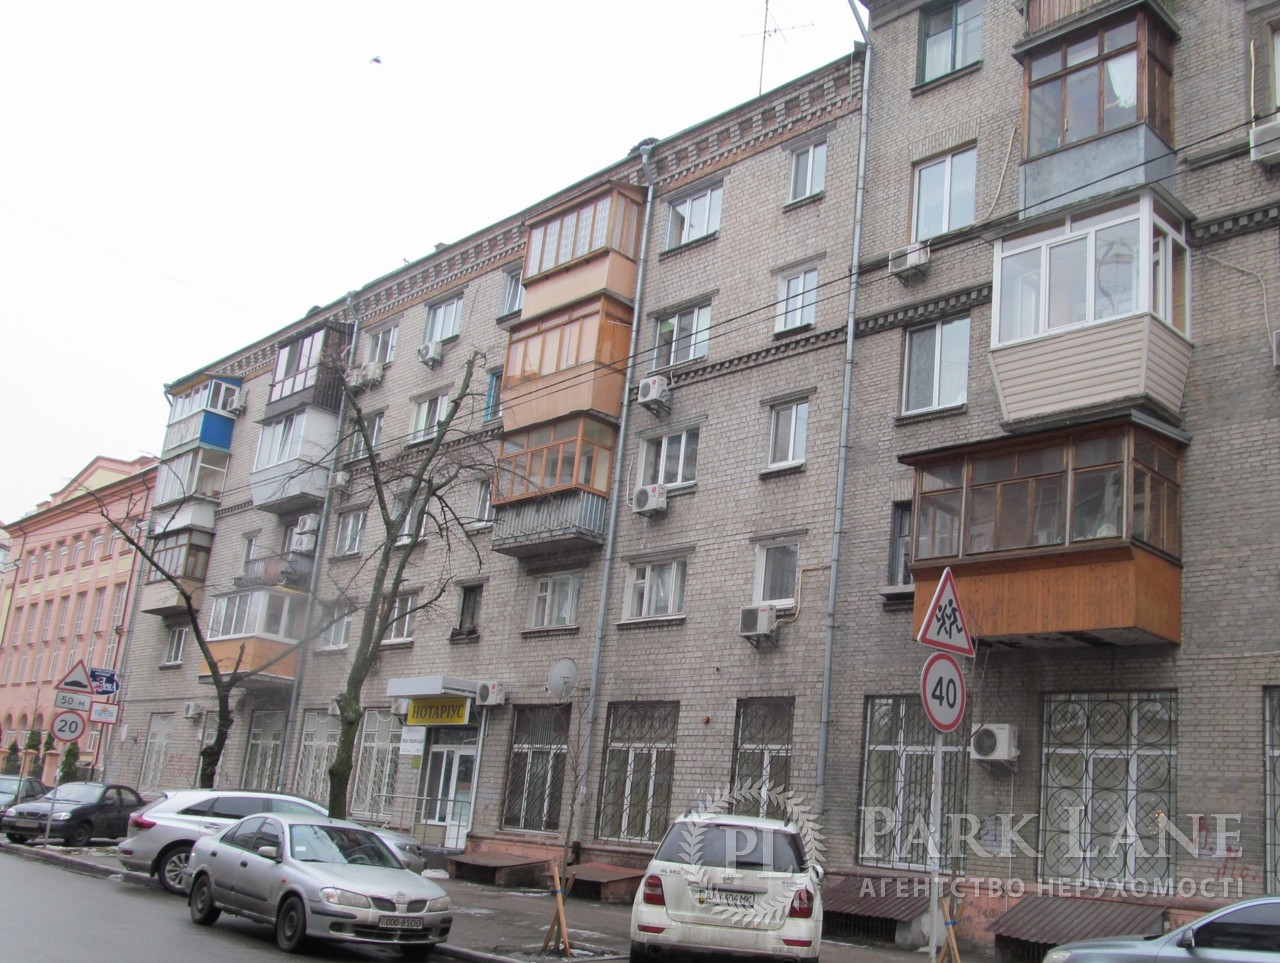 Квартира ул. Почайнинская, 53/55, Киев, Z-125352 - Фото 1